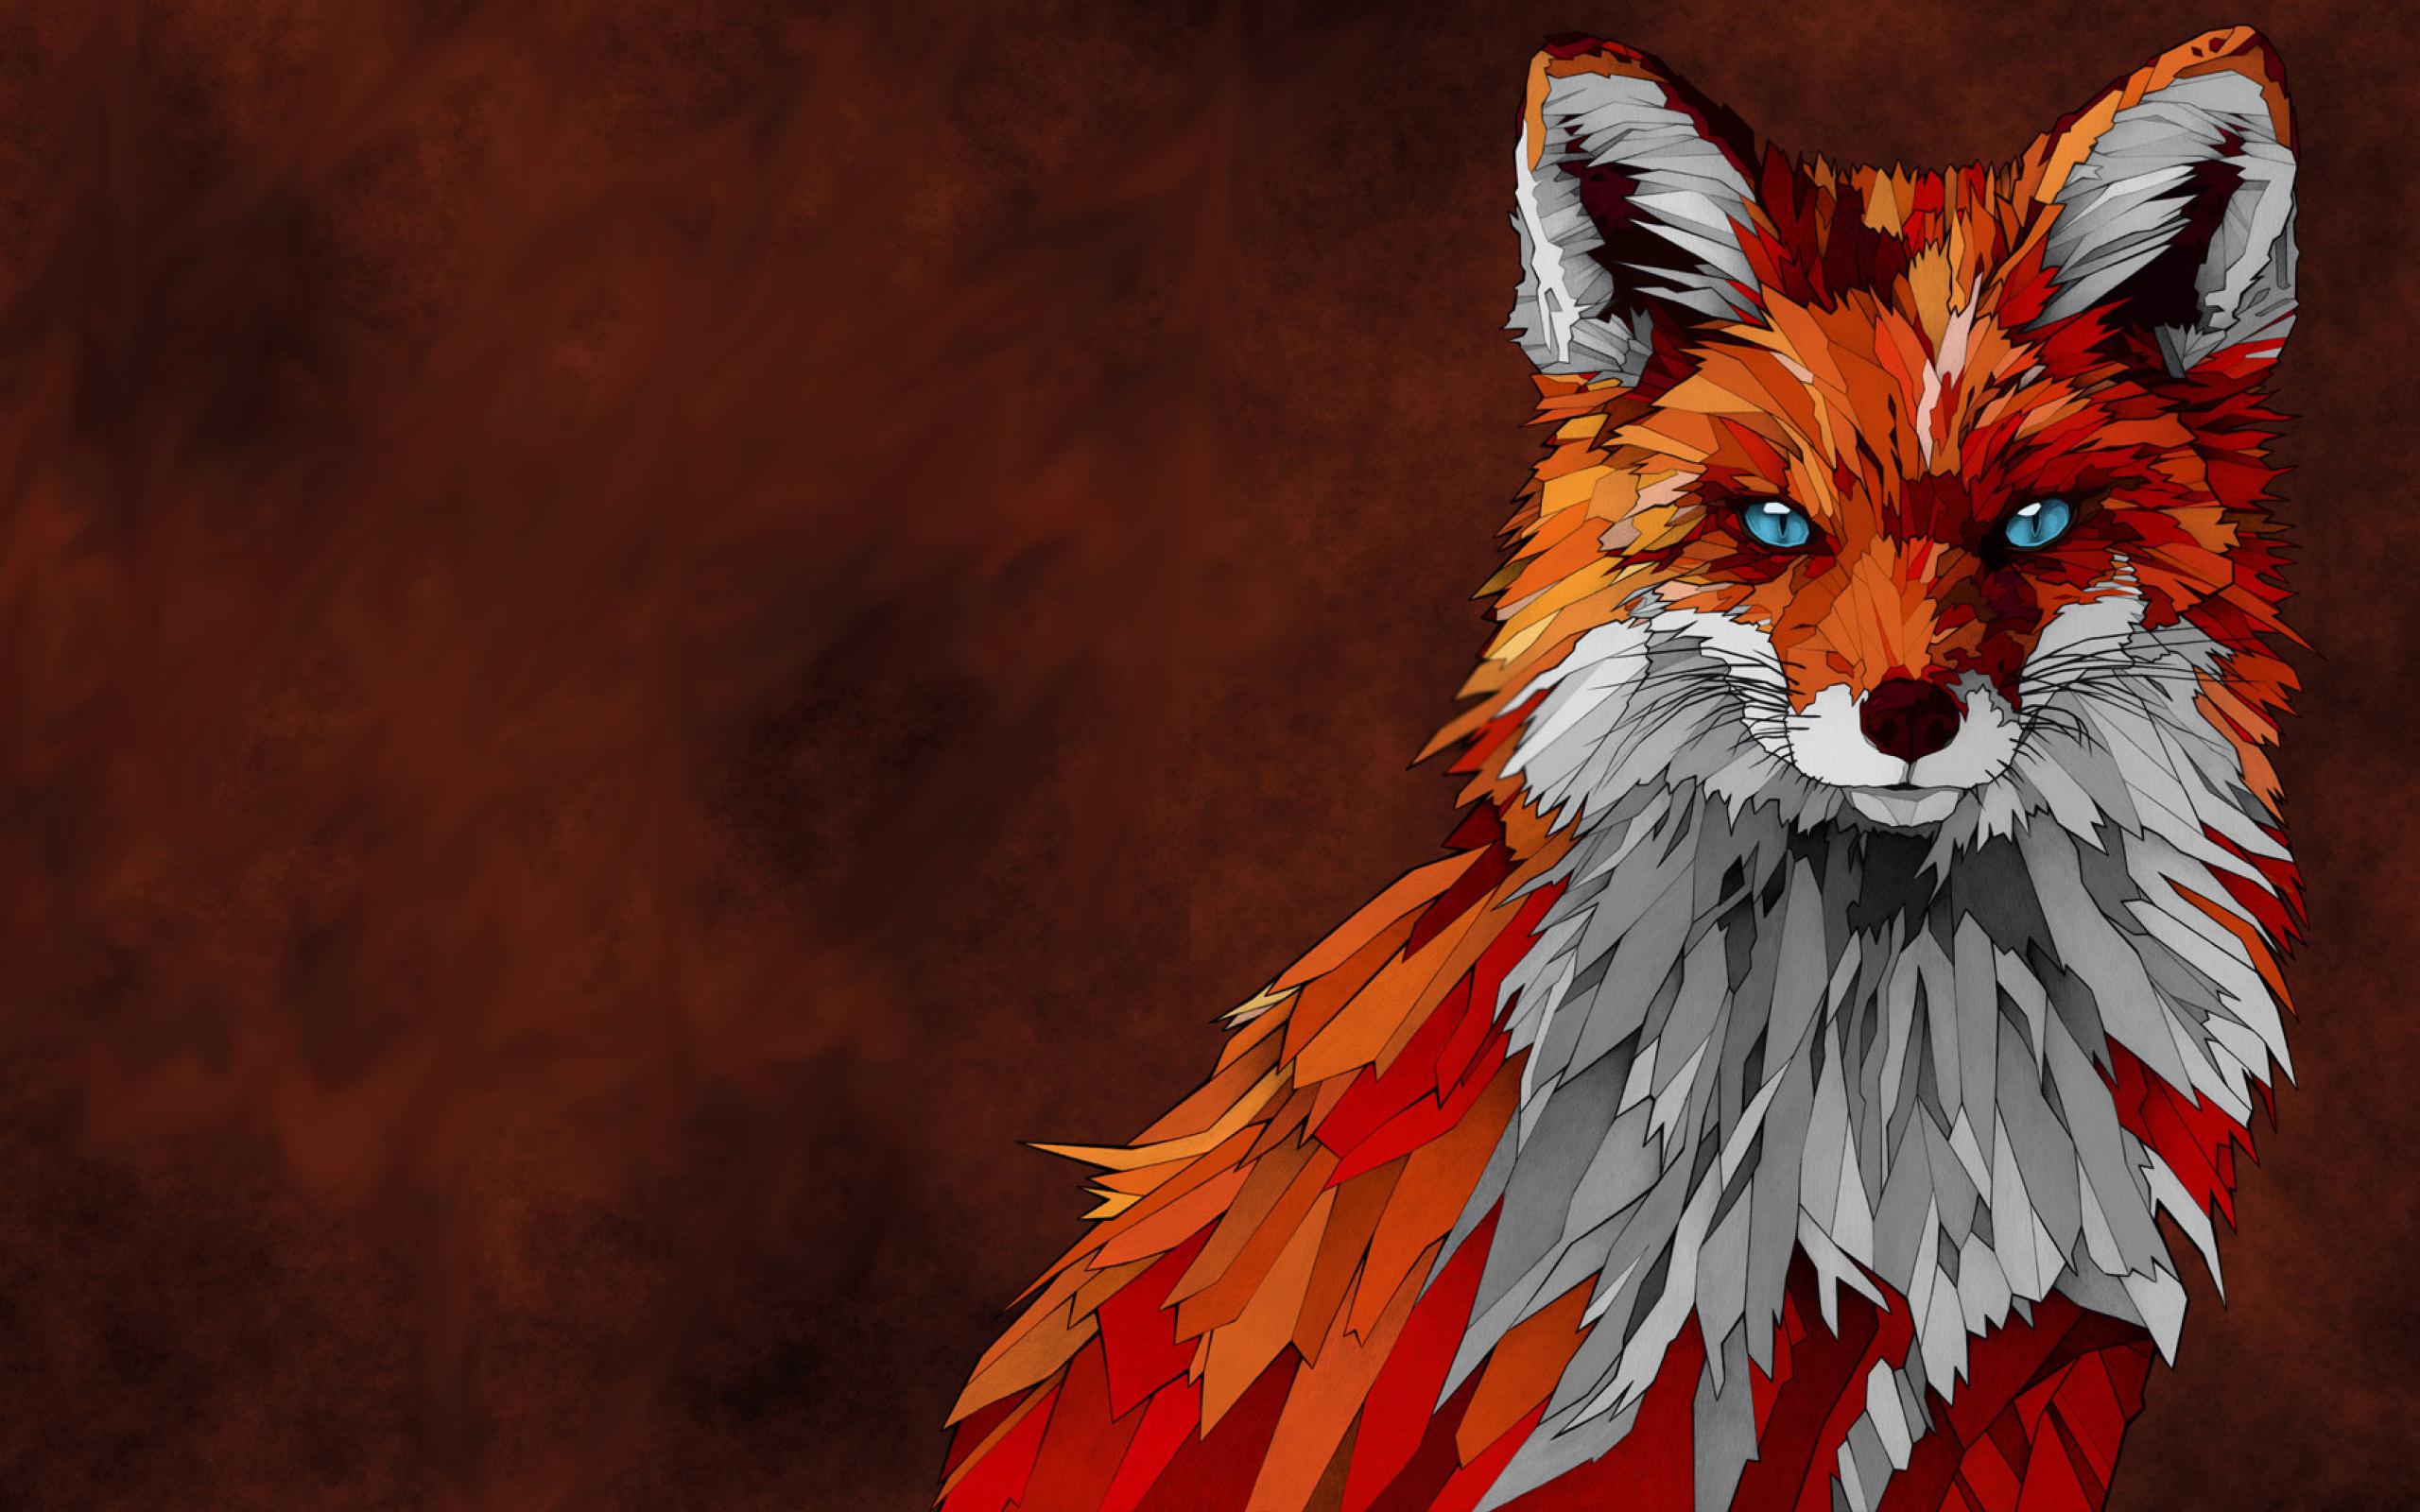 Fox animal artwork full hd wallpaper - Fox desktop background ...